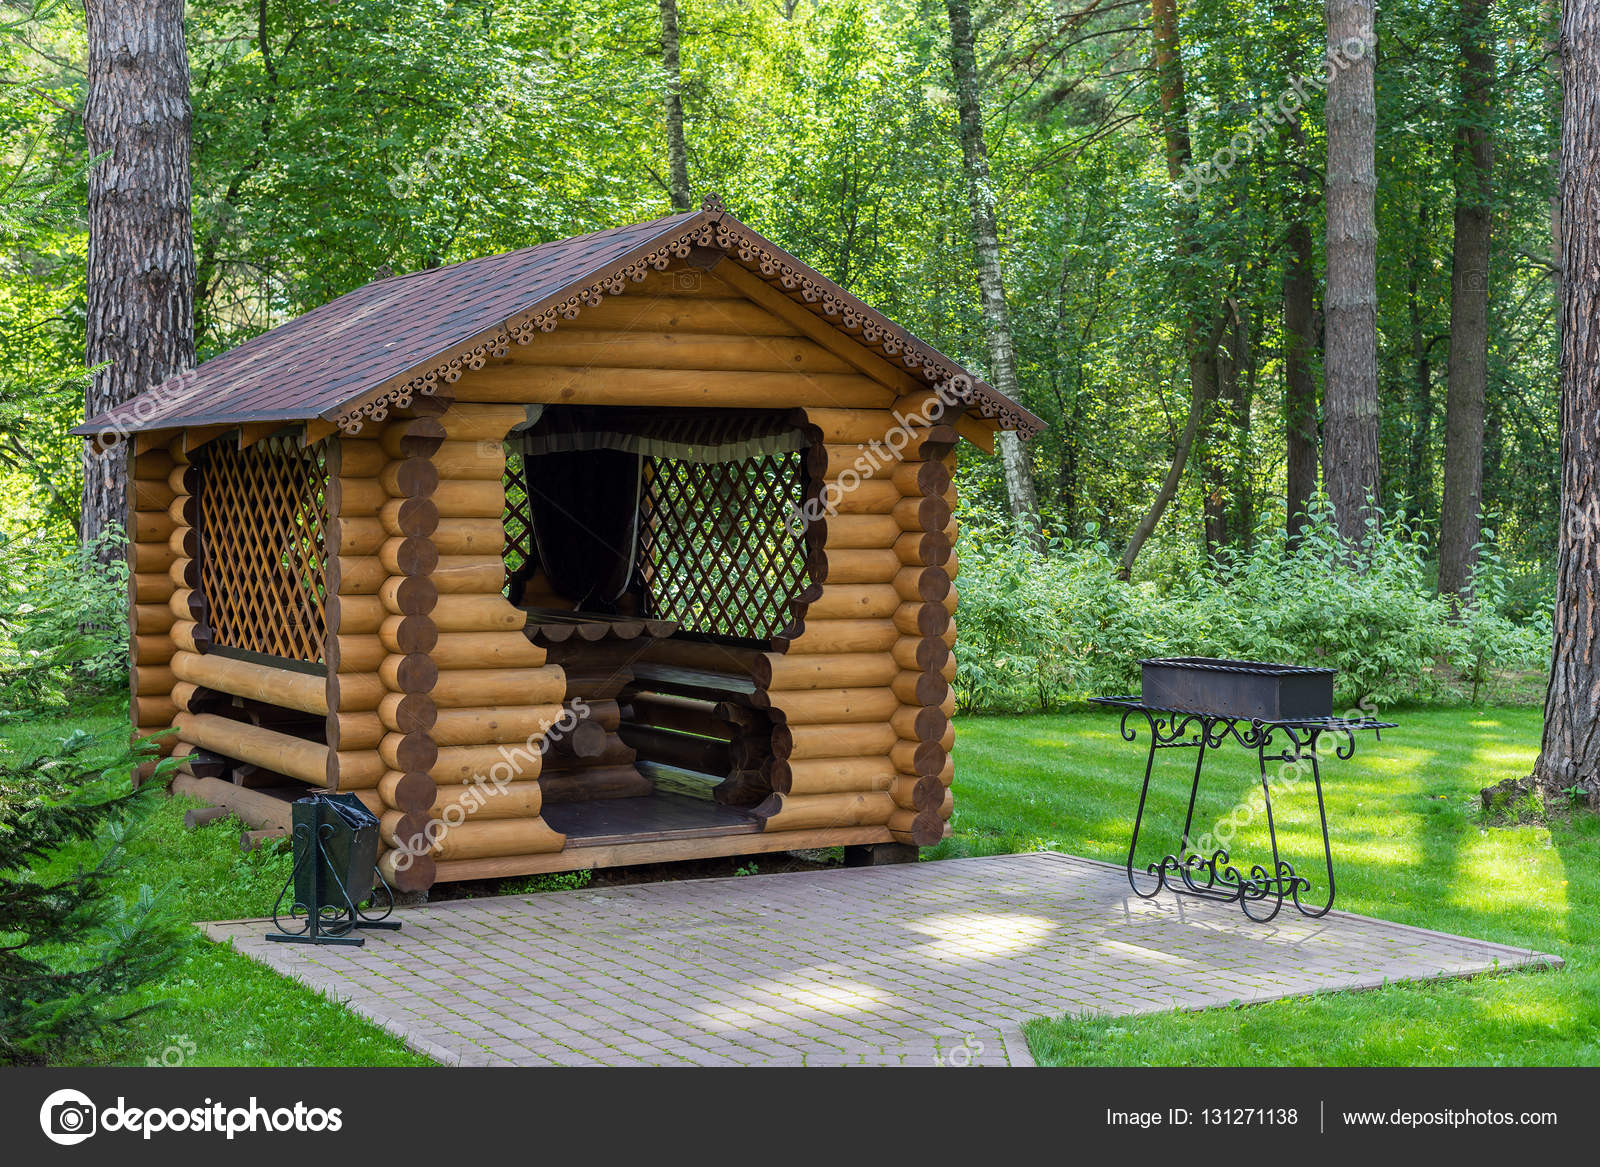 muebles de jardín de madera — Foto de stock © Lazurny #131271138